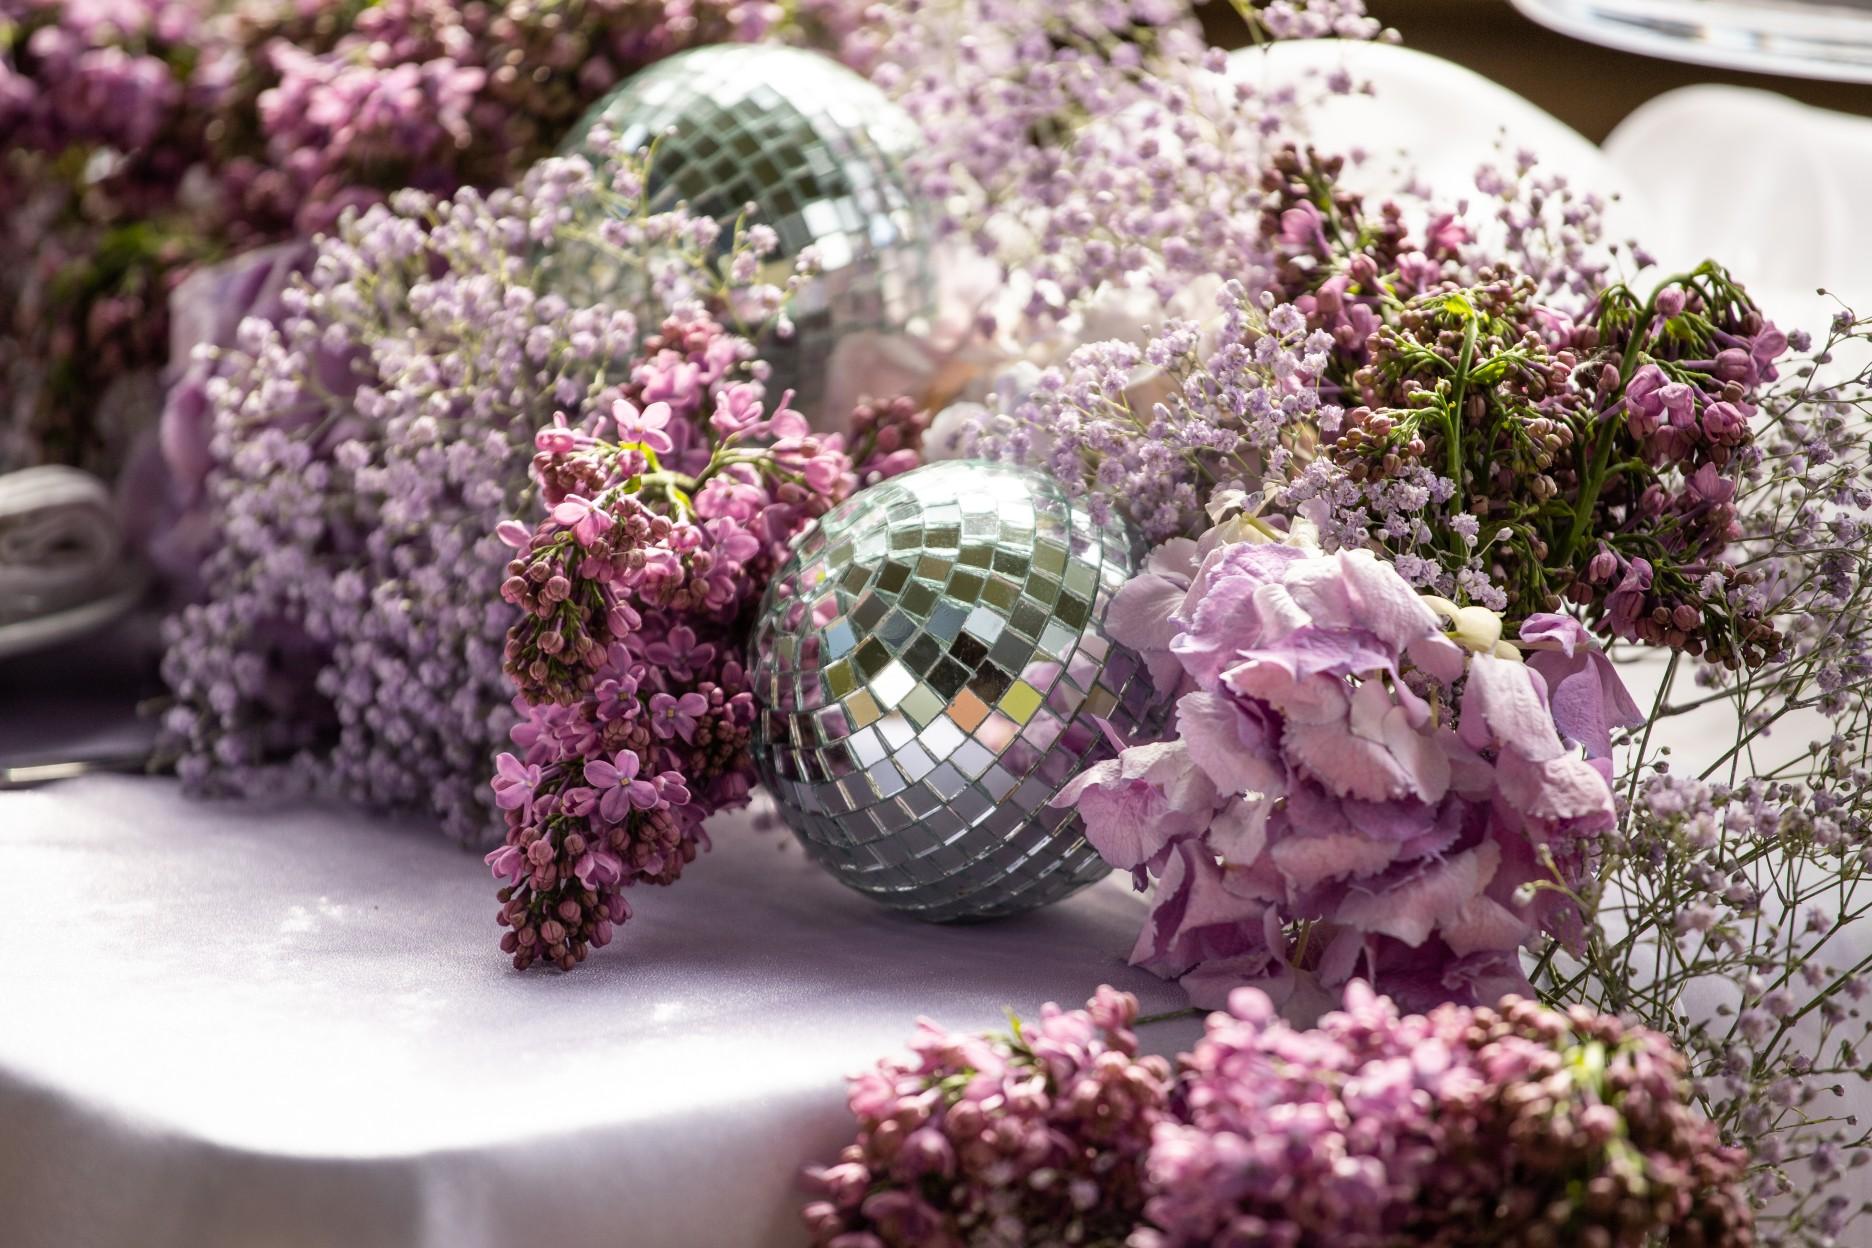 disco ball wedding decoration - unique wedding table decor - purple wedding flowers - purple wedding decor